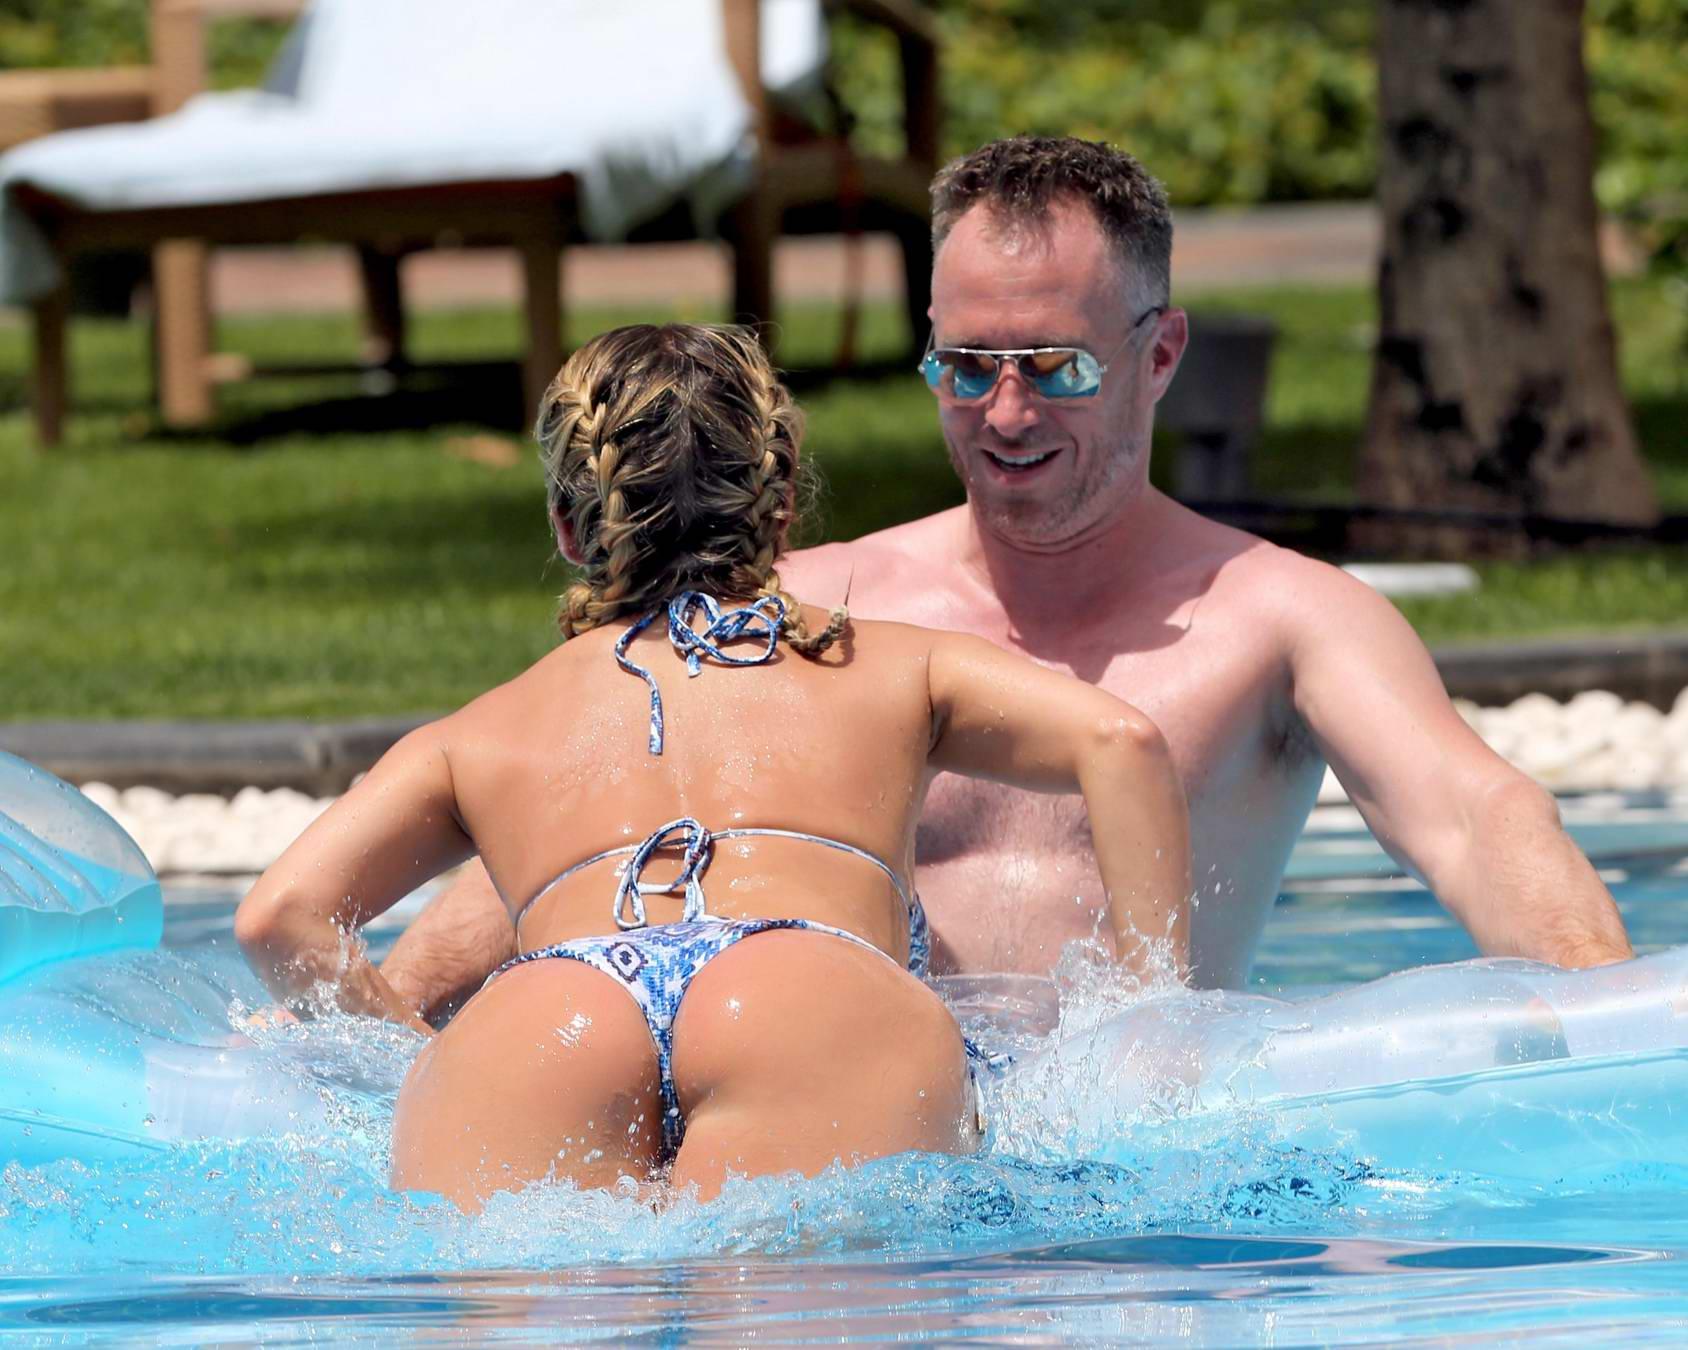 Alexandra Vittek Topless Nude Photo Collection - 7 Photos advise